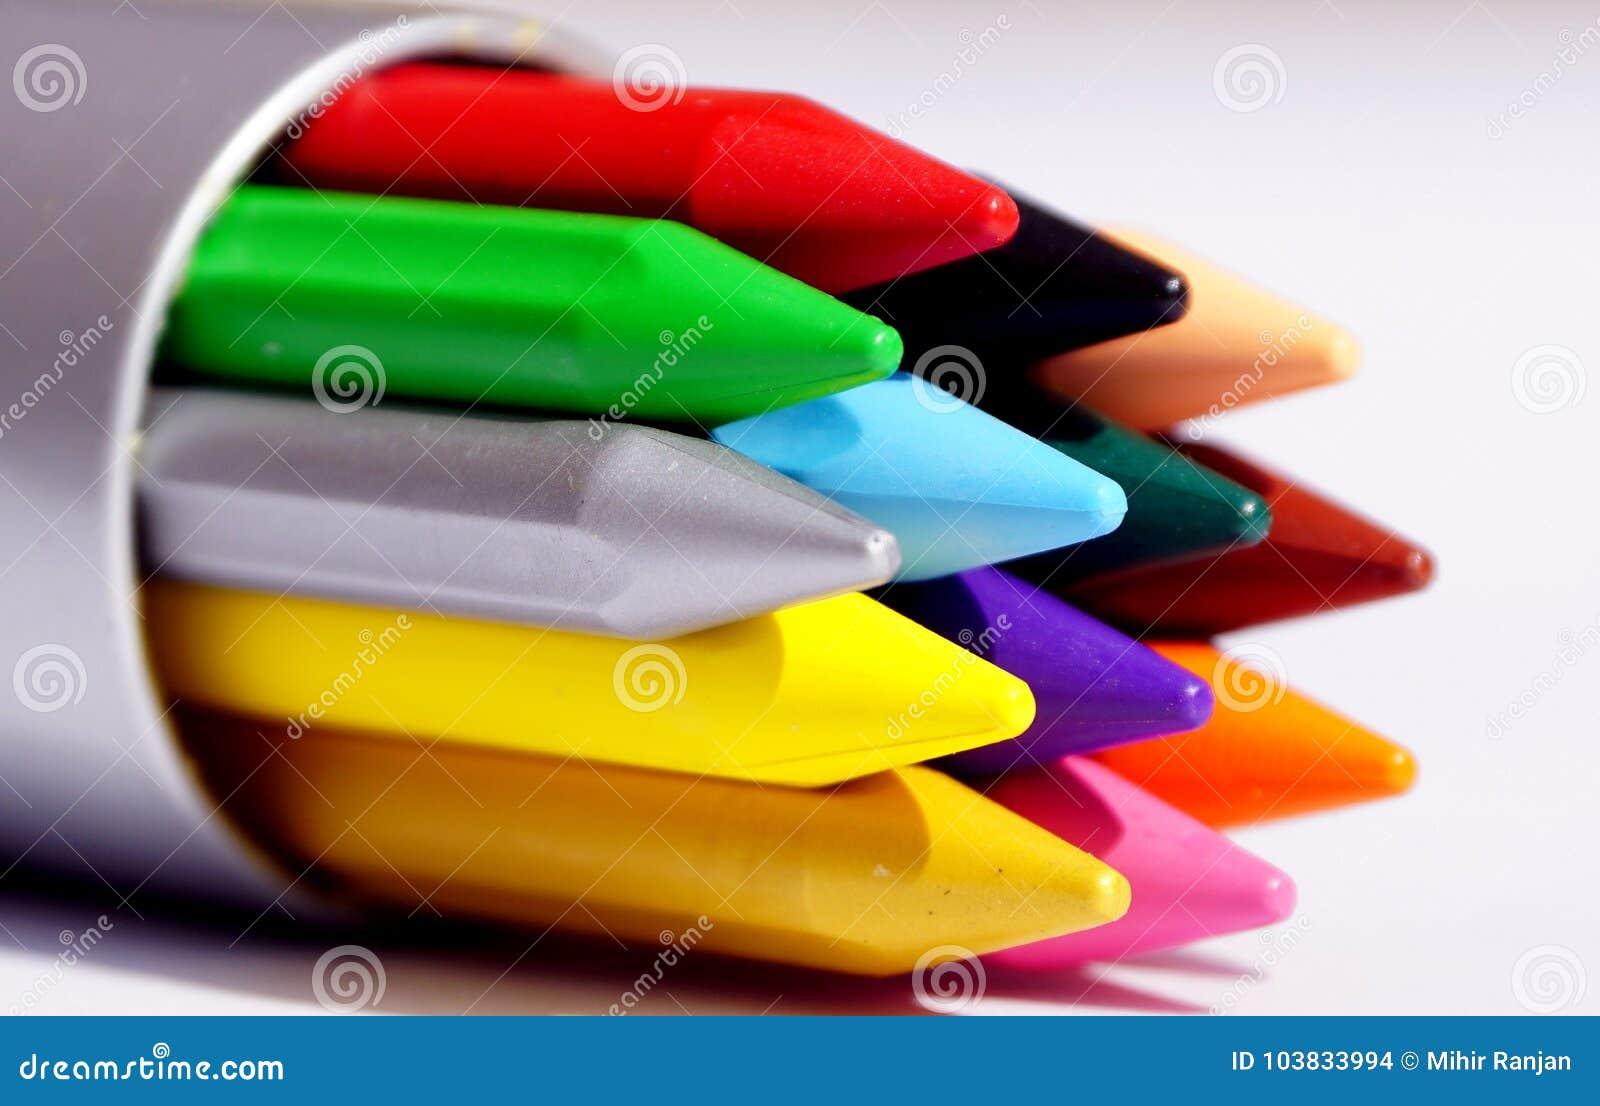 Pastéis do plástico da cor